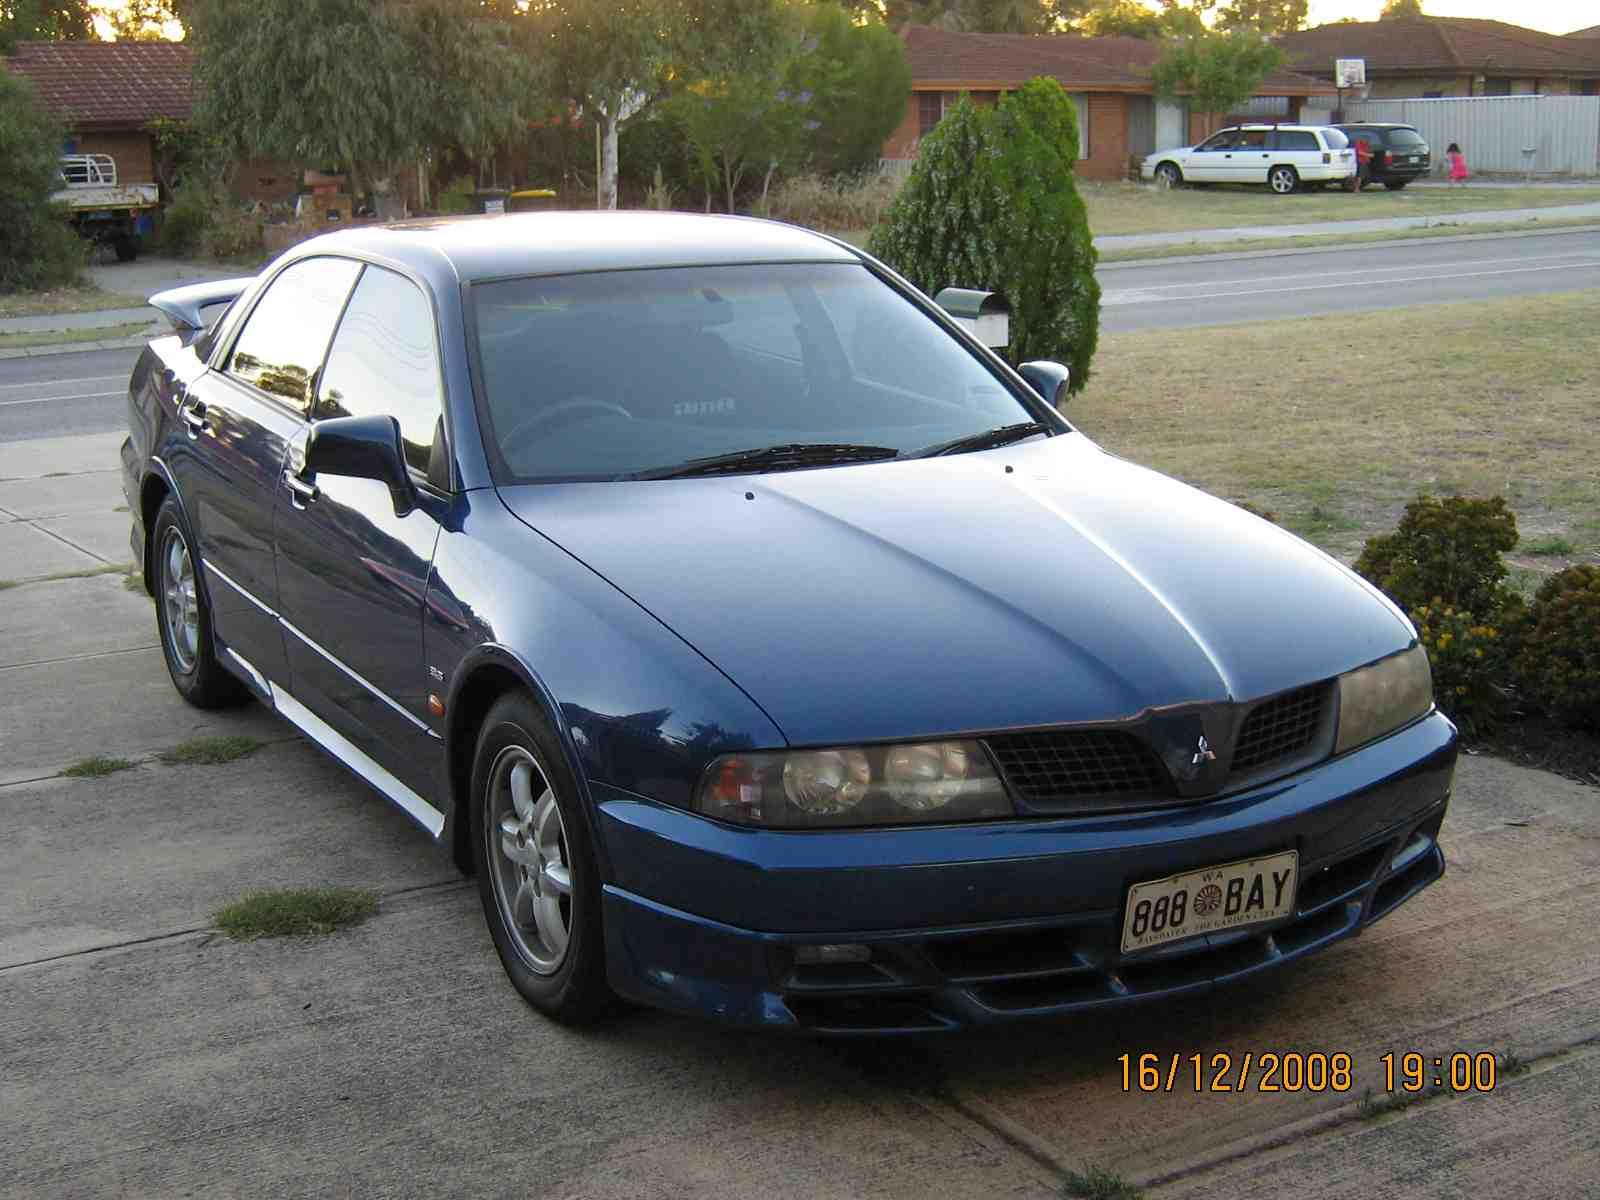 Mitsubishi Magna (1998-2001 TH Series, 1998-2002 TJ Series), Verada  Diamante (1998-2001 KH Series, 1998-2002 KJ Series), Ralliart Magna  (2000-2002 TJ ...